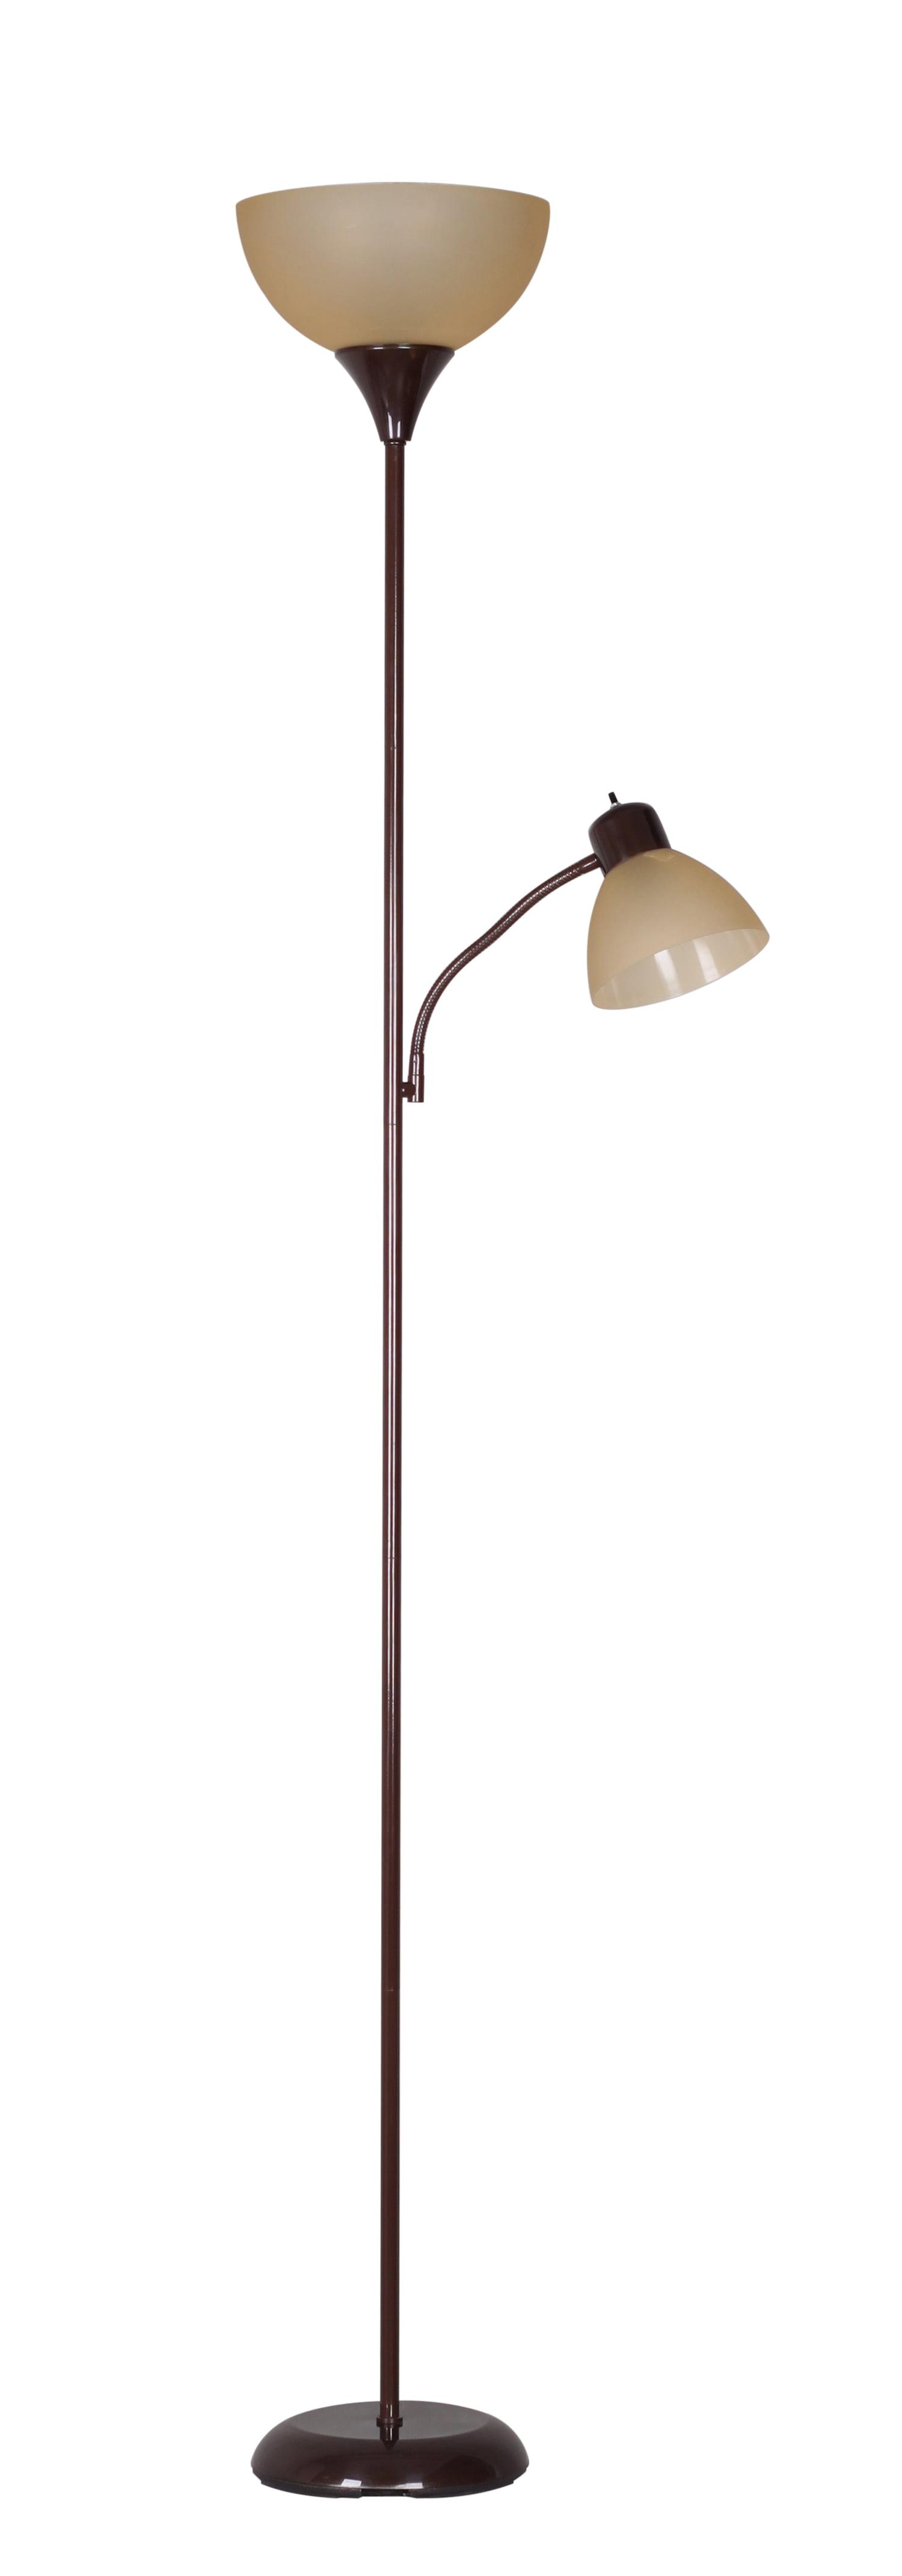 Mainstays 72'' Combo Floor Lamp with Adjustable Reading Lamp, Brown - Walmart.com